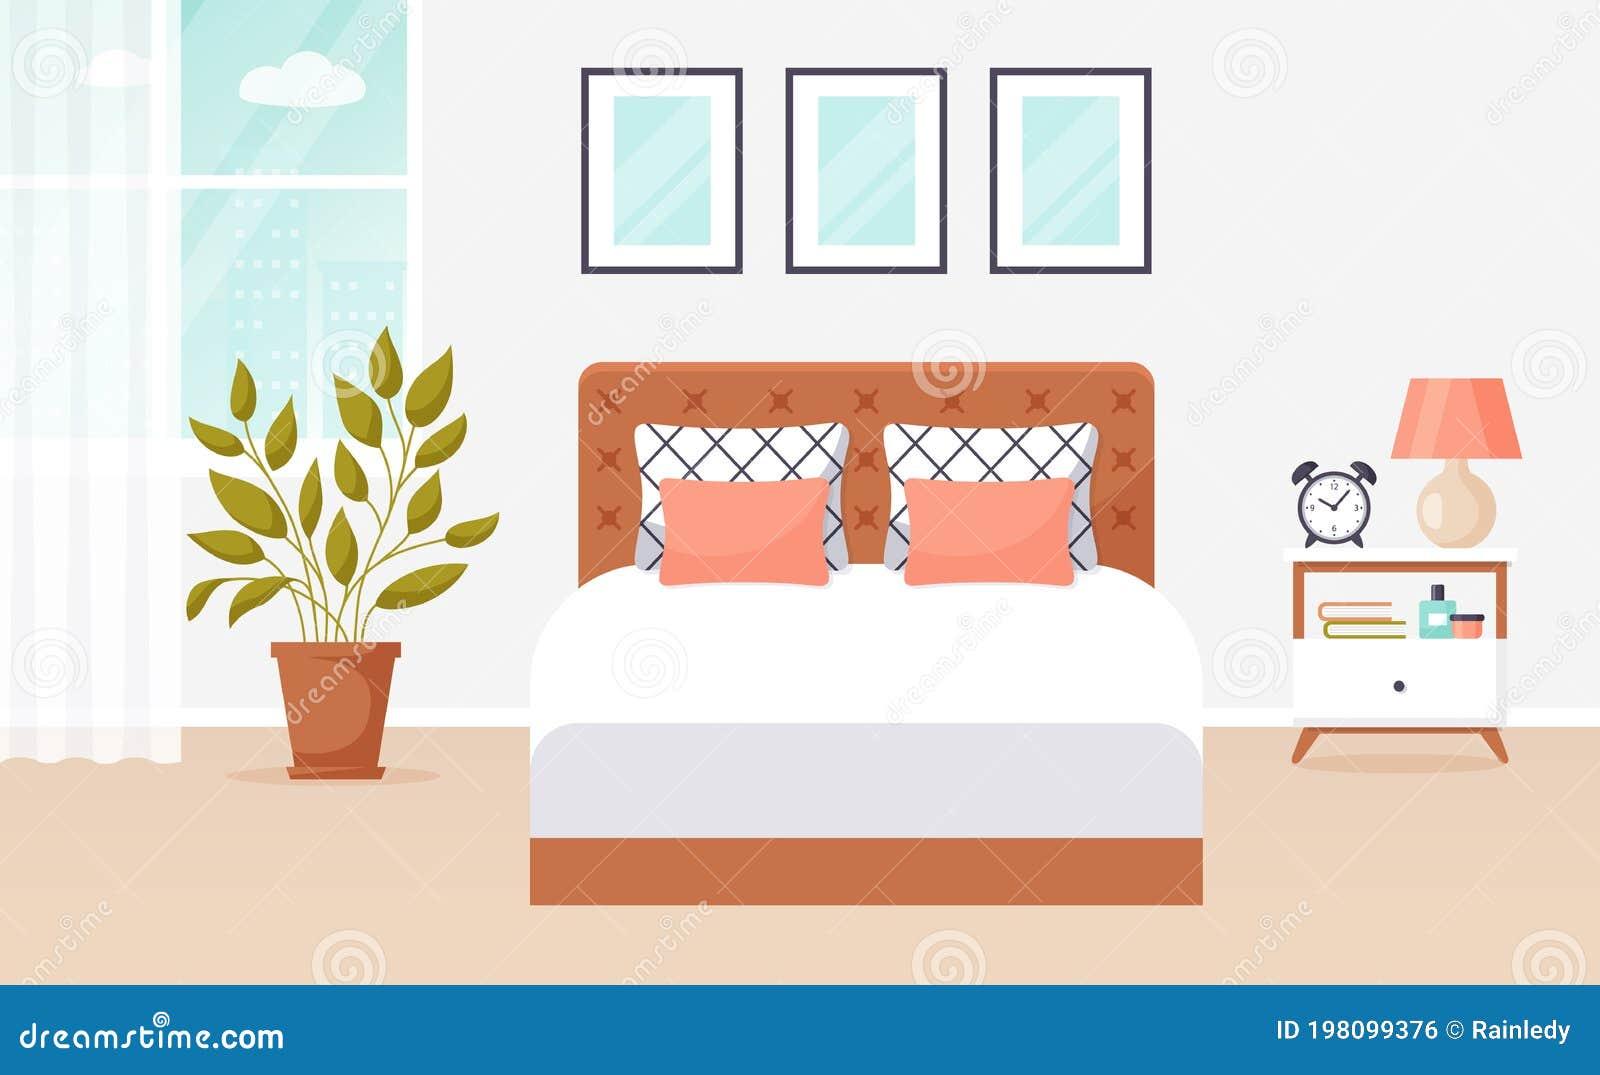 Bedroom Interior Design Vector Banner Stock Vector Illustration Of Clock Guest 198099376